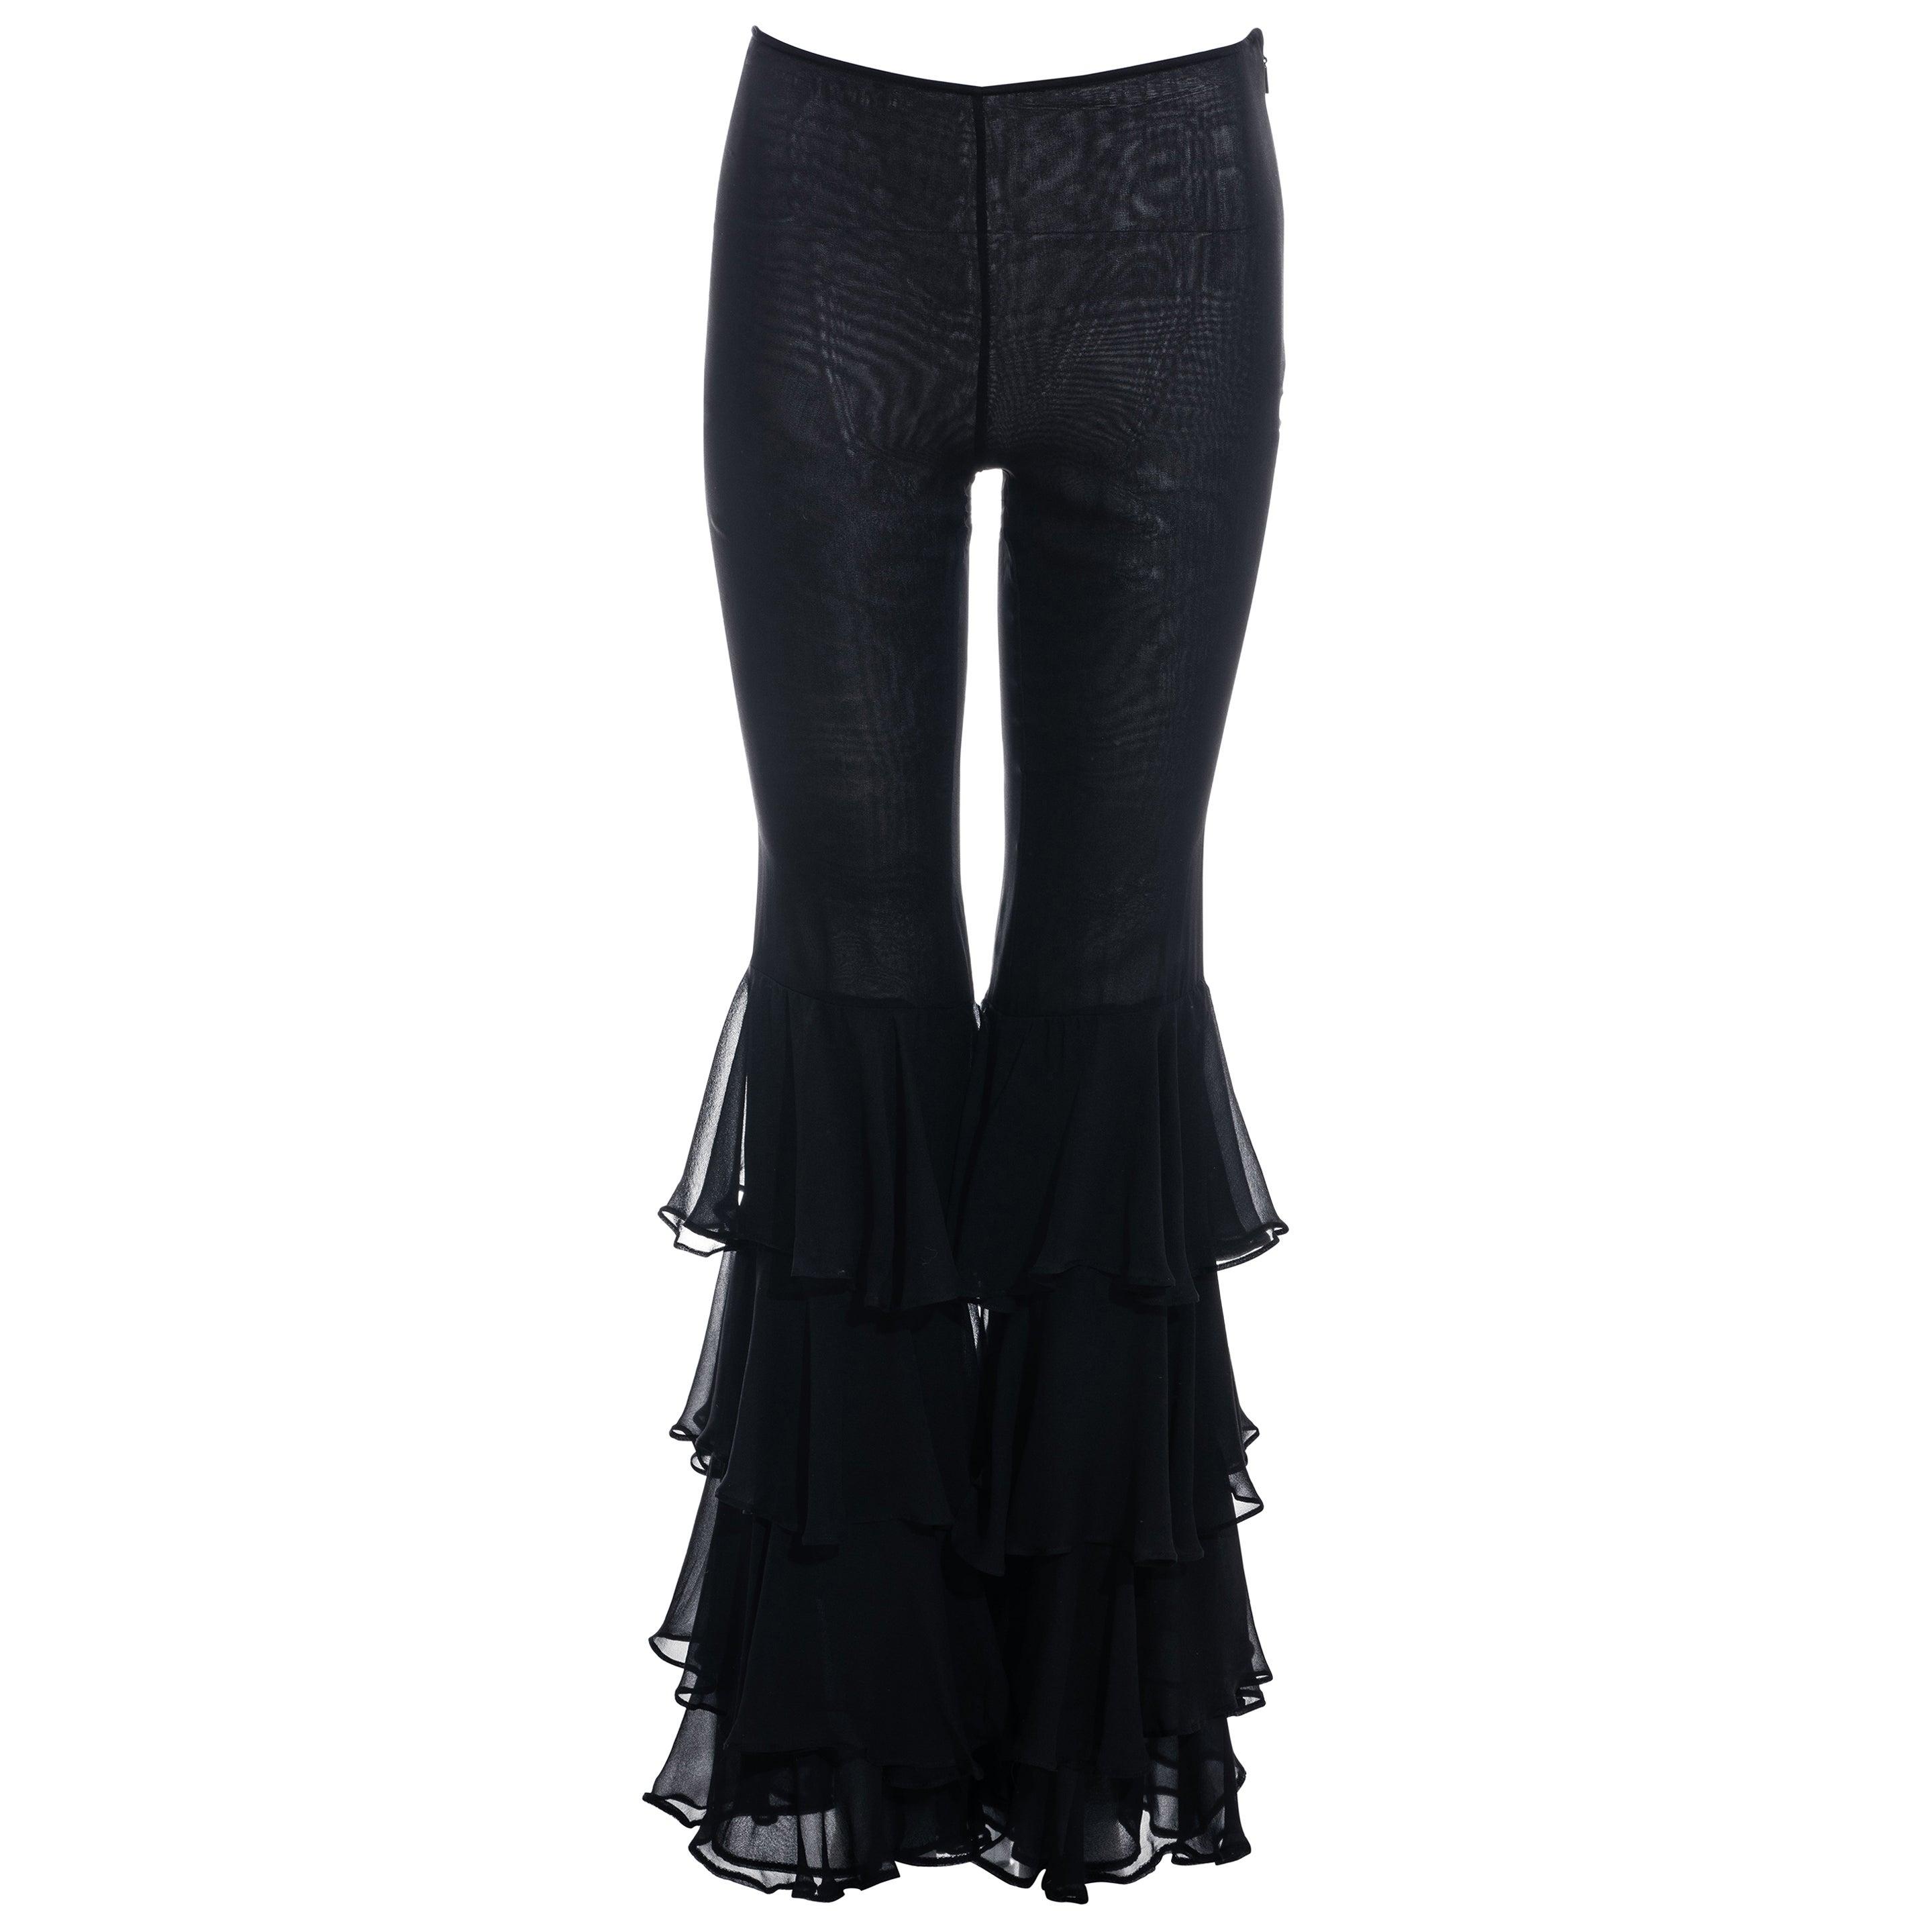 Gucci by Tom Ford black silk chiffon ruffled evening pants, fw 1999